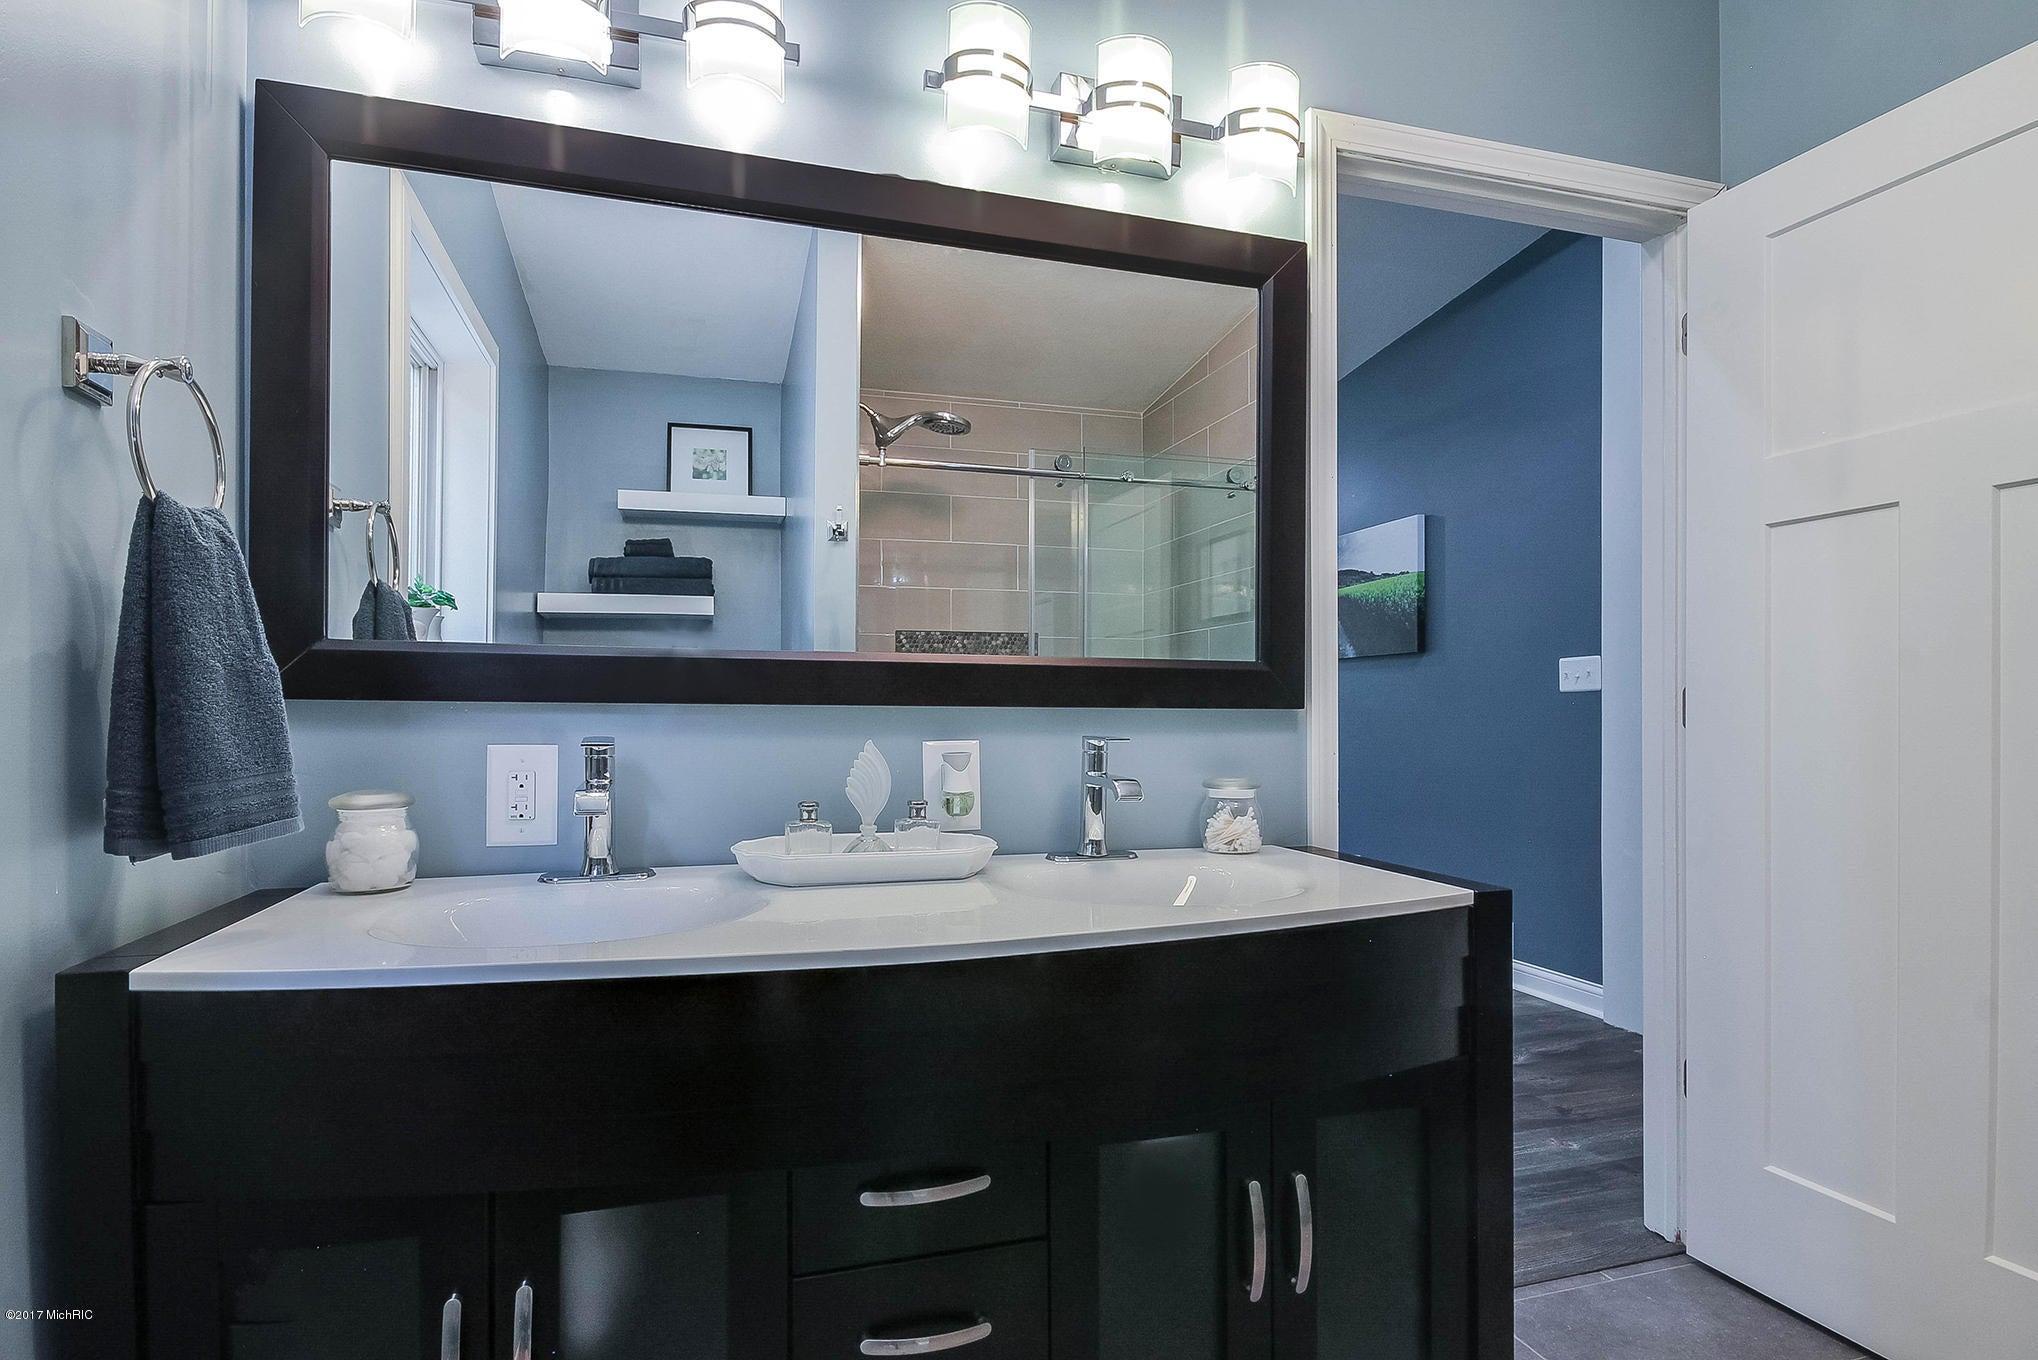 Bathroom Cabinets Grand Rapids Mi 3502 bayberry drive nw, grand rapids, mi, 49544, mls # 17042915